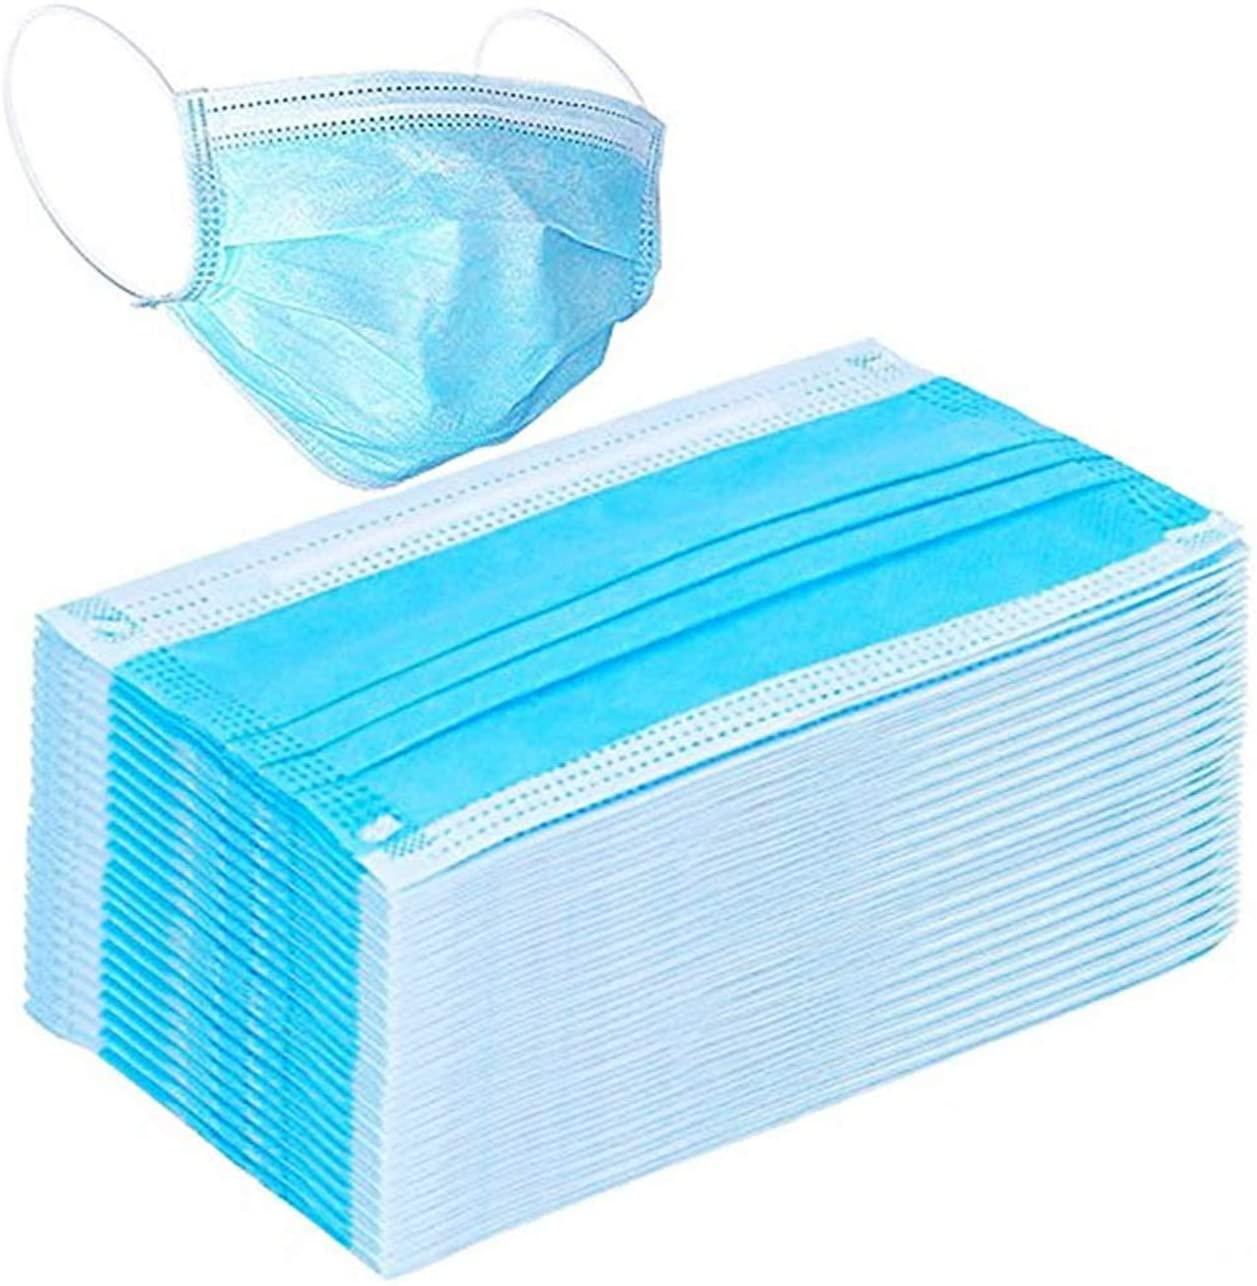 50Pcs Disposable Filter Mask 3 Ply Earloop Face Masks-B14